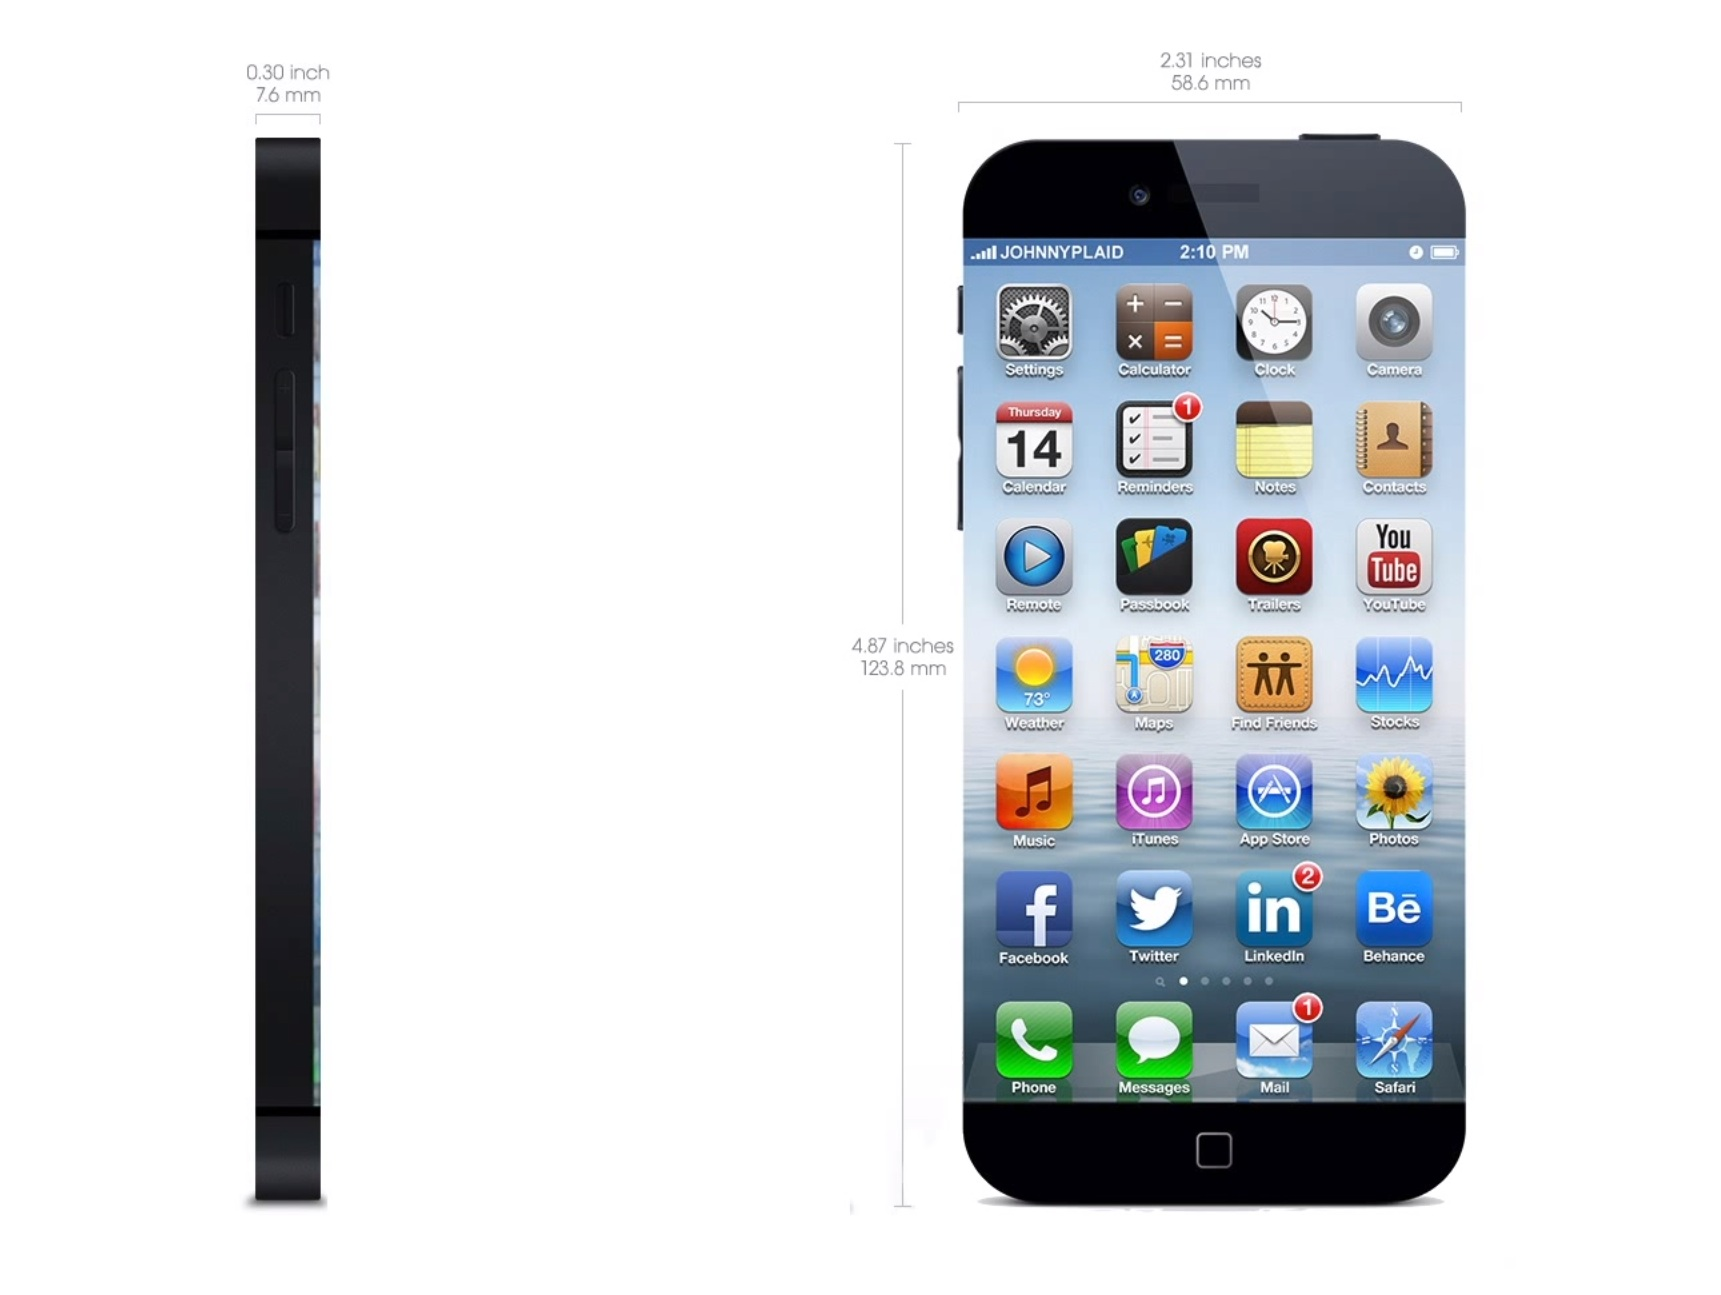 FAYAN SALES iPhone 6 Concept Edge to Edge Display Smart Home 1721x1295